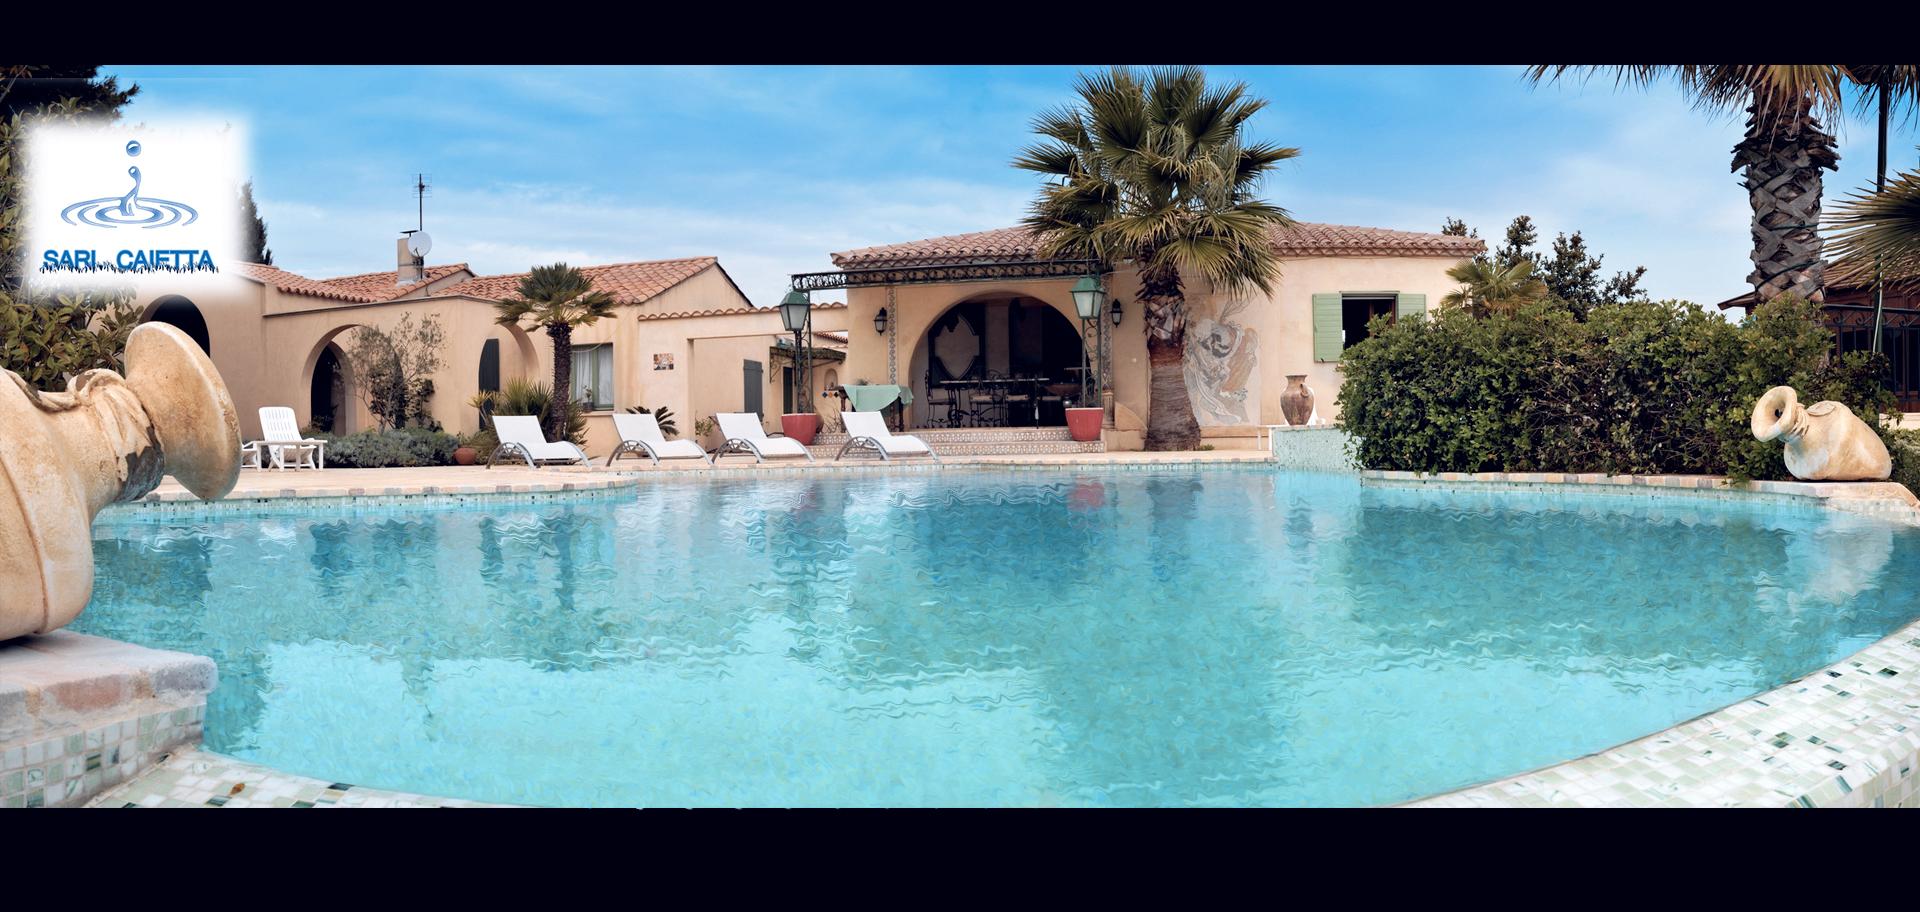 piscines sarl caietta piscine sauna hammam spa. Black Bedroom Furniture Sets. Home Design Ideas